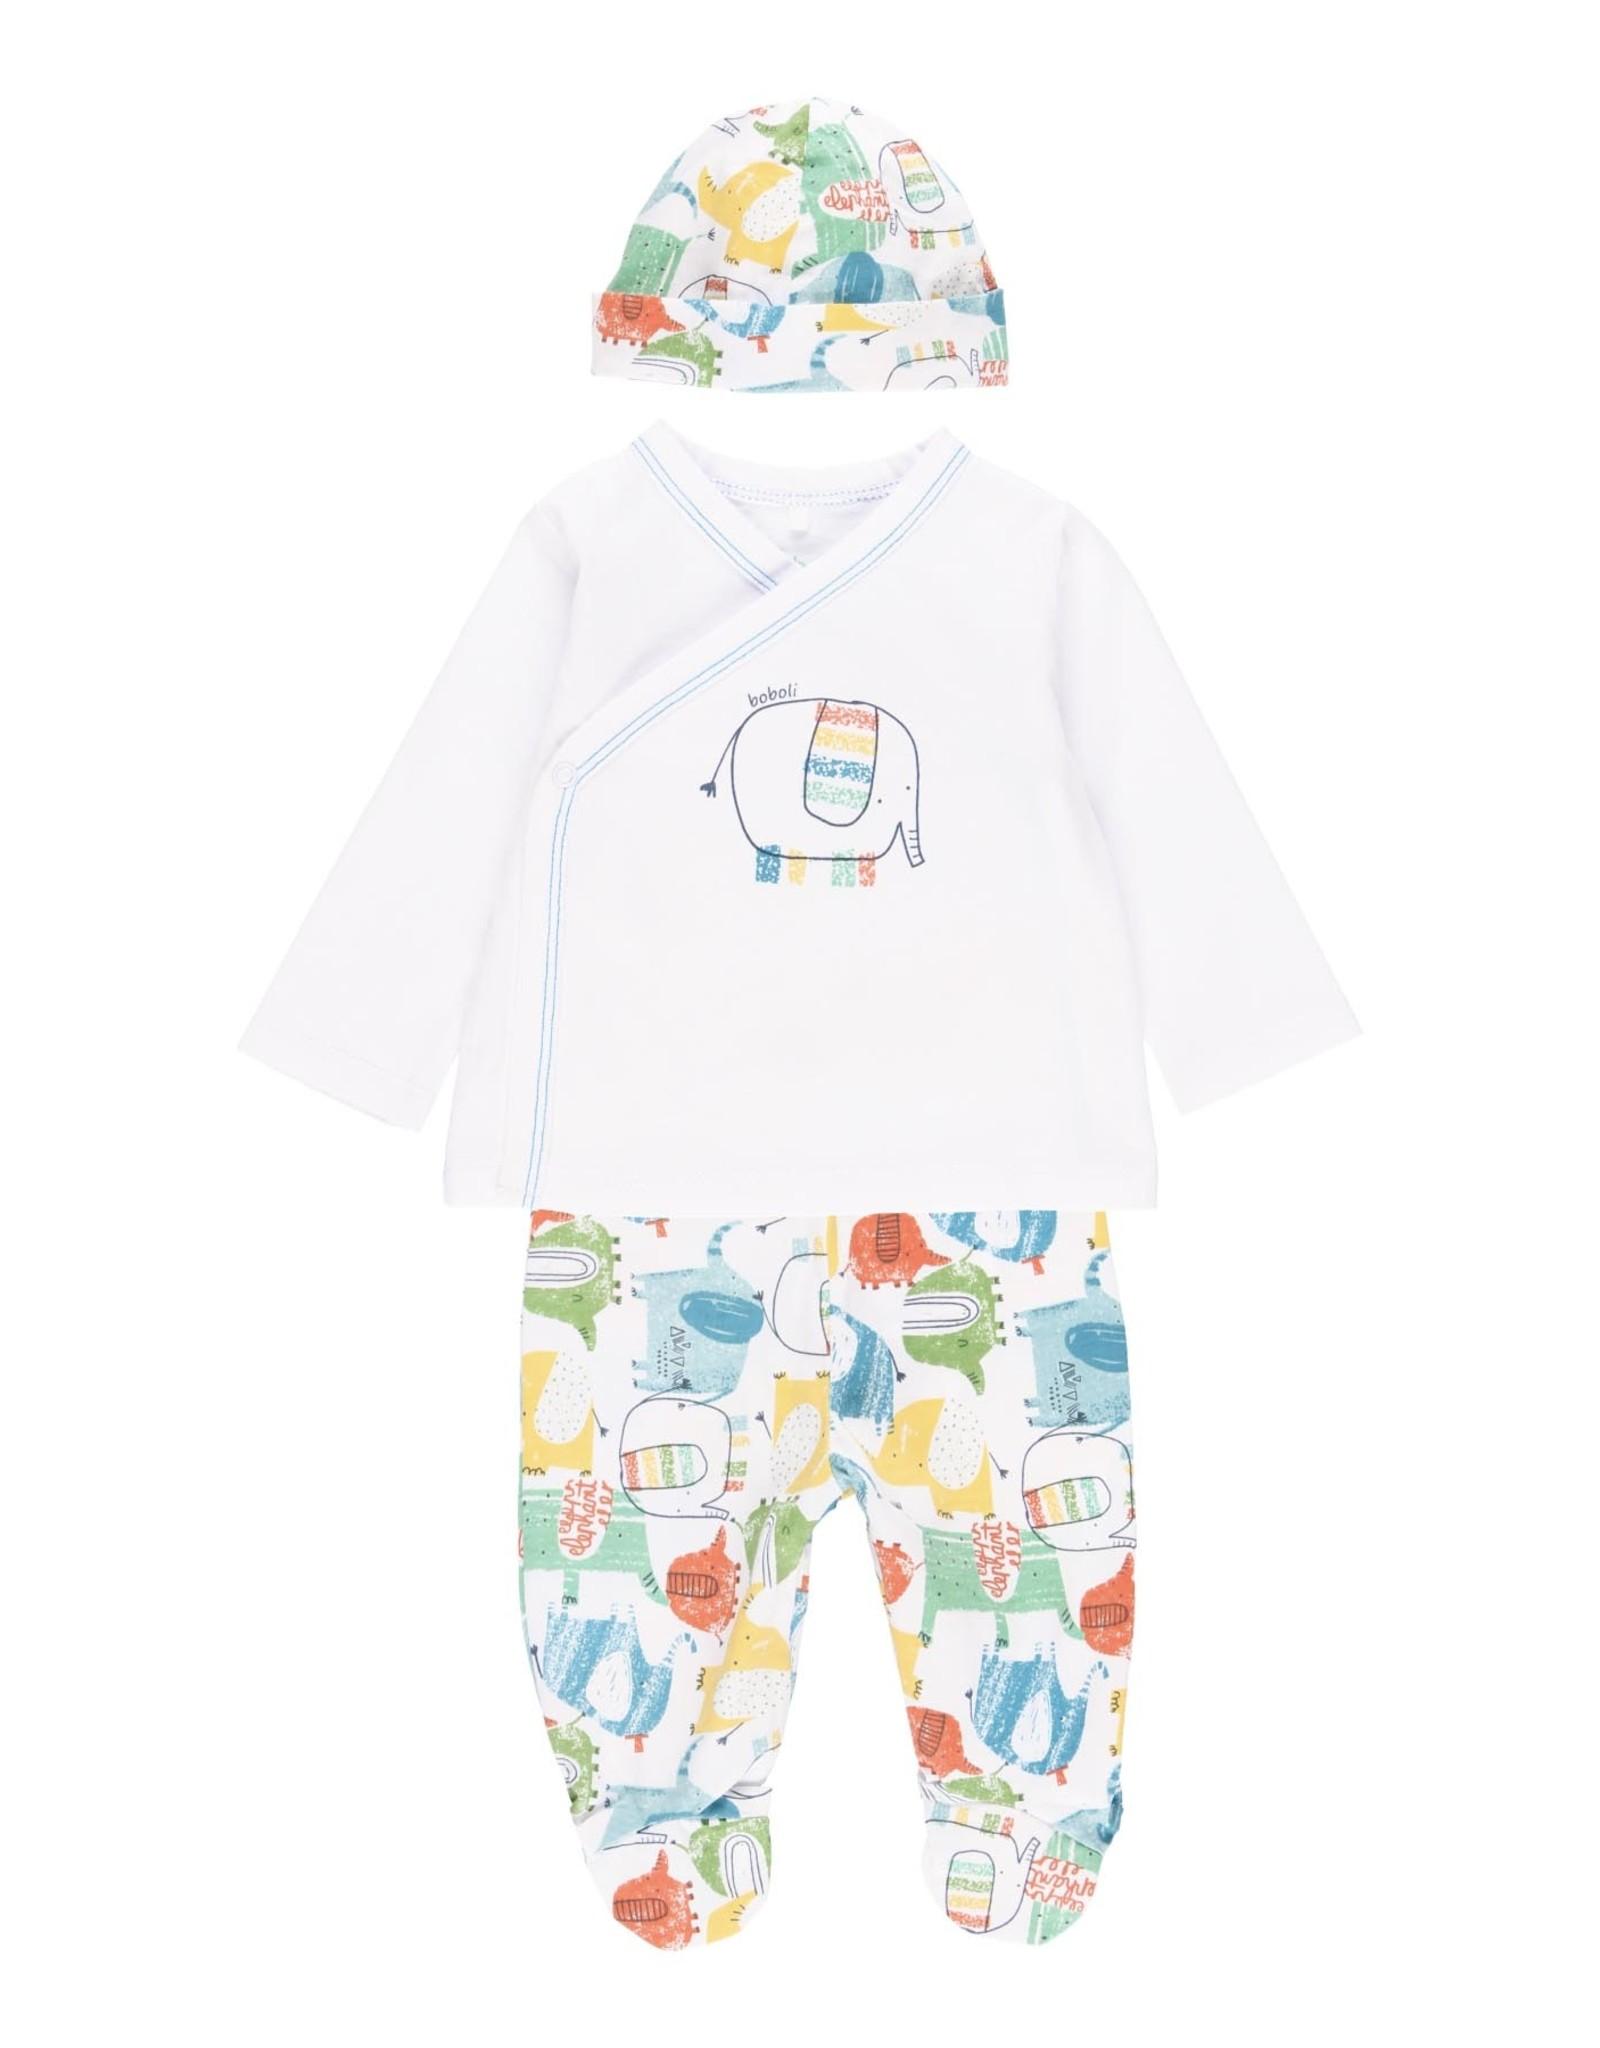 Boboli Gift Set, Elephant Shirt, Pants and Hat